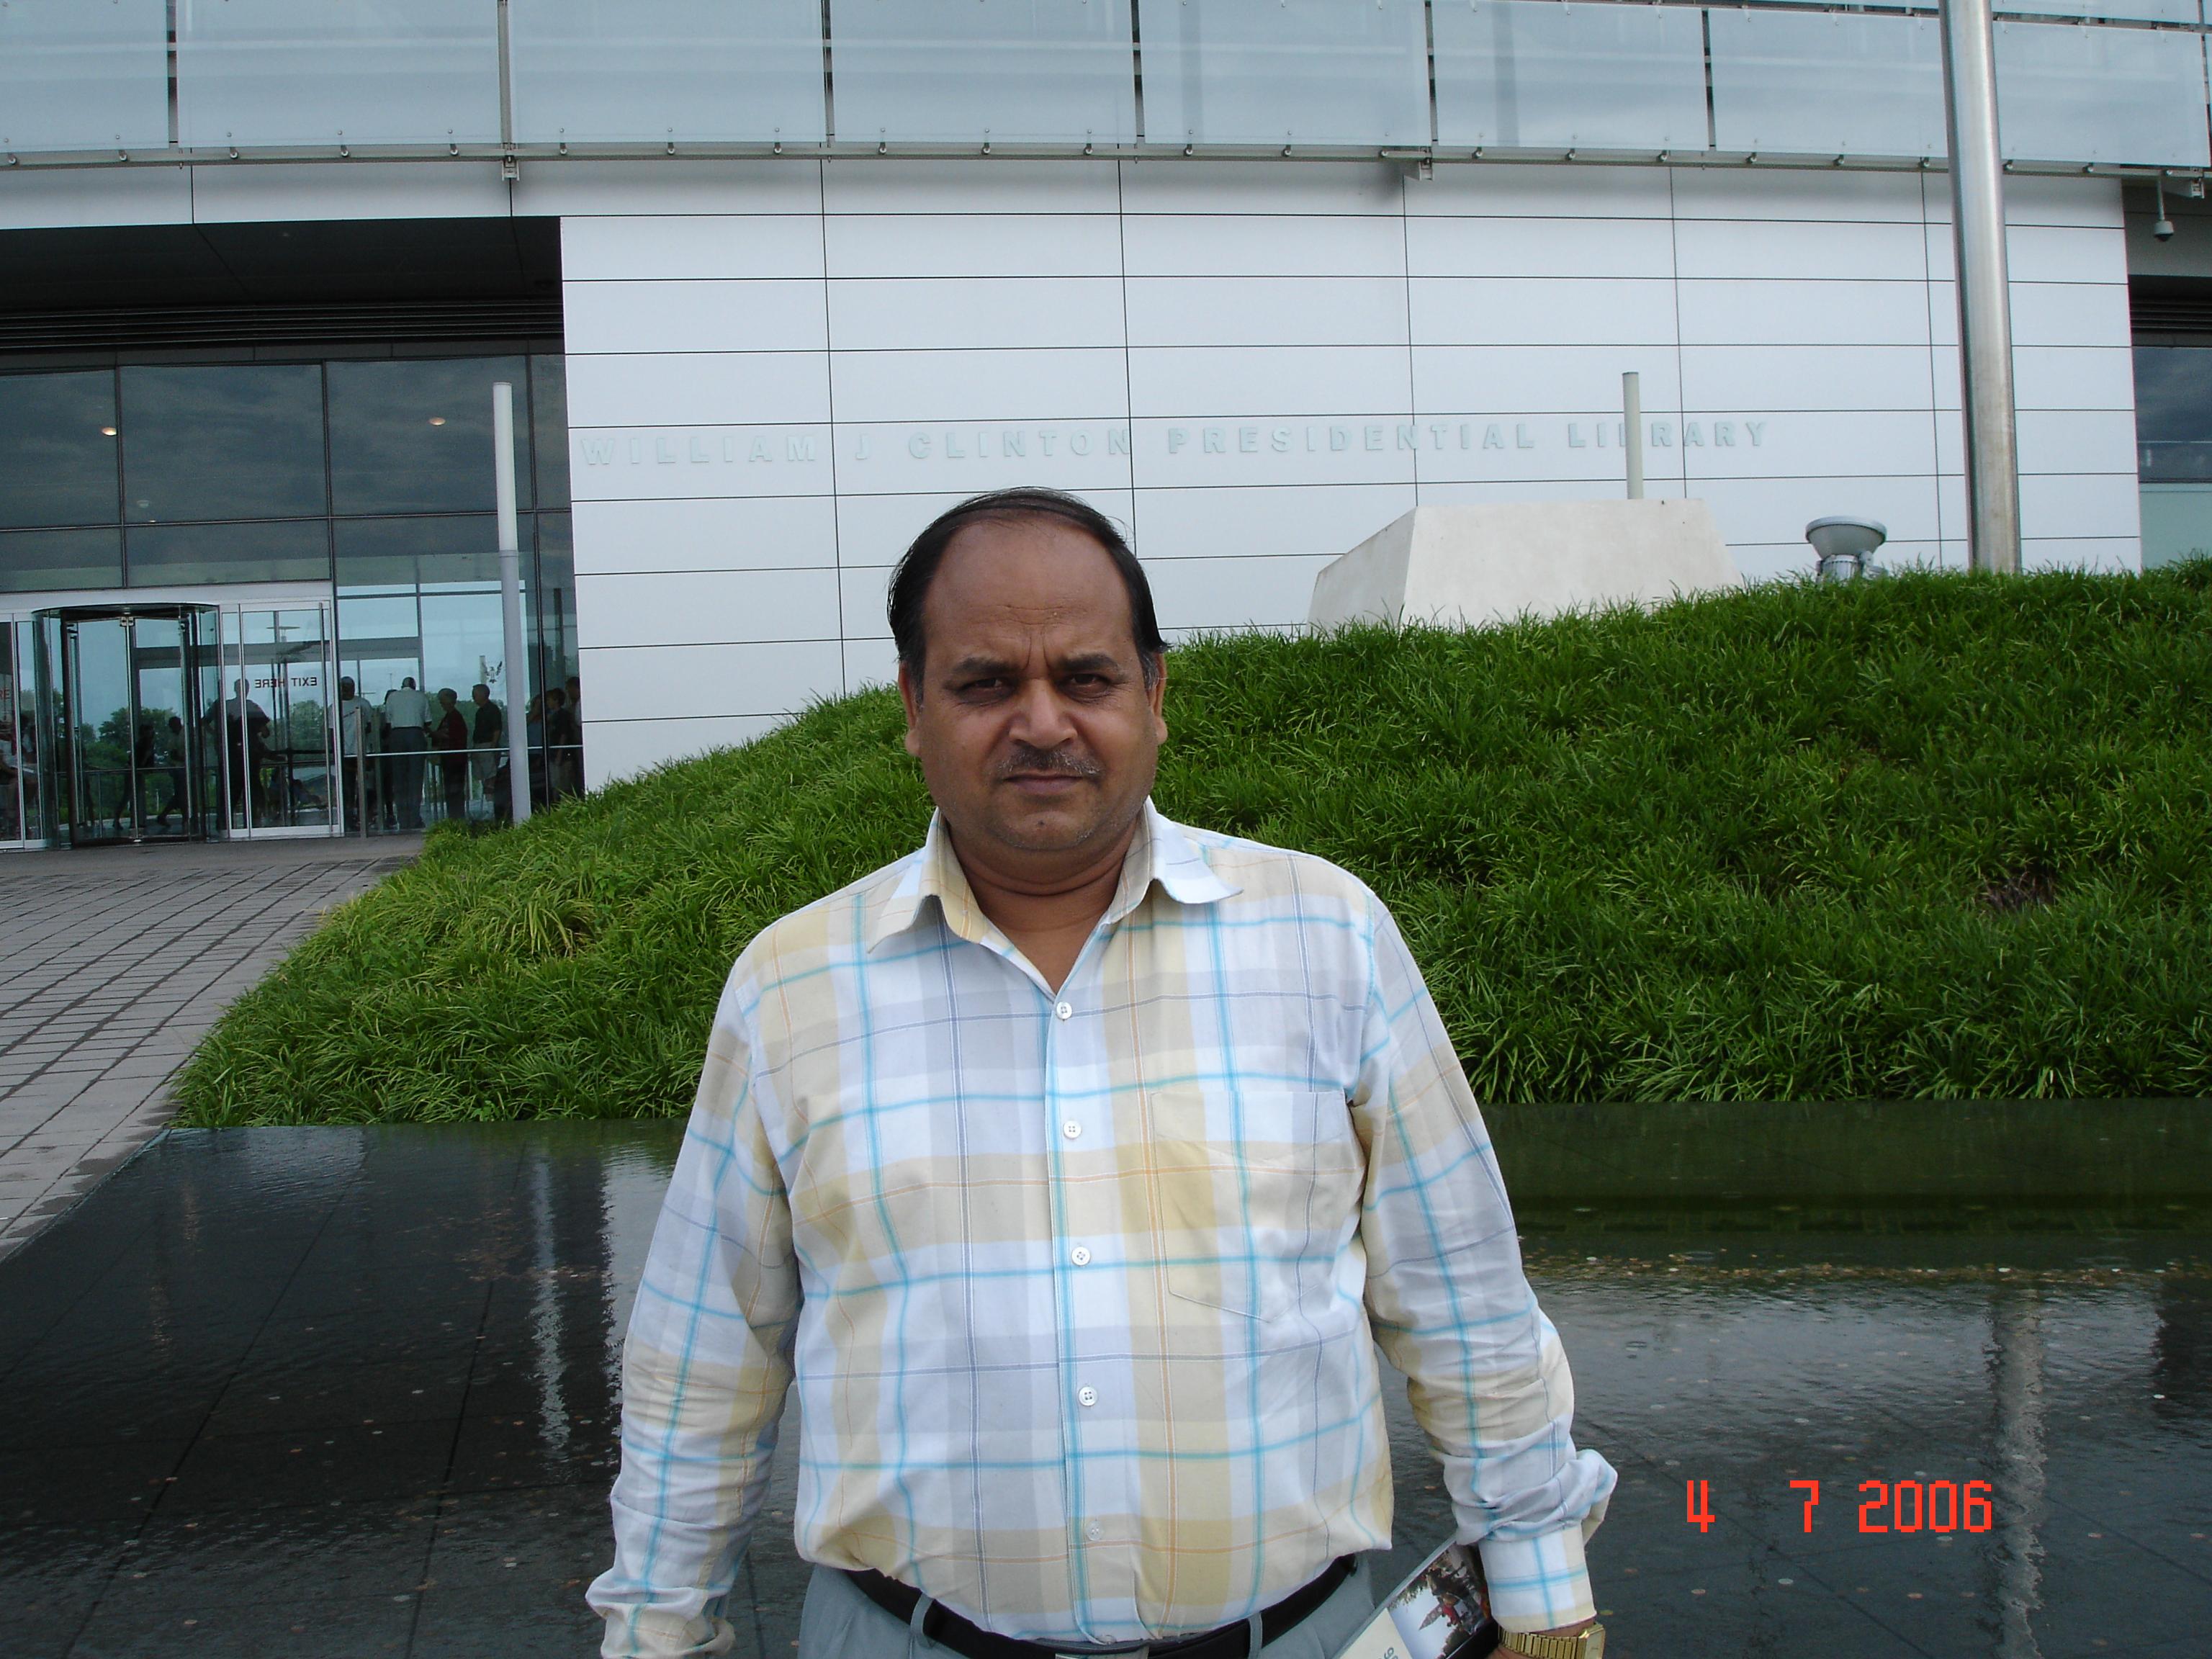 Profile image of Raghava, Dr Gajendra Pal Singh